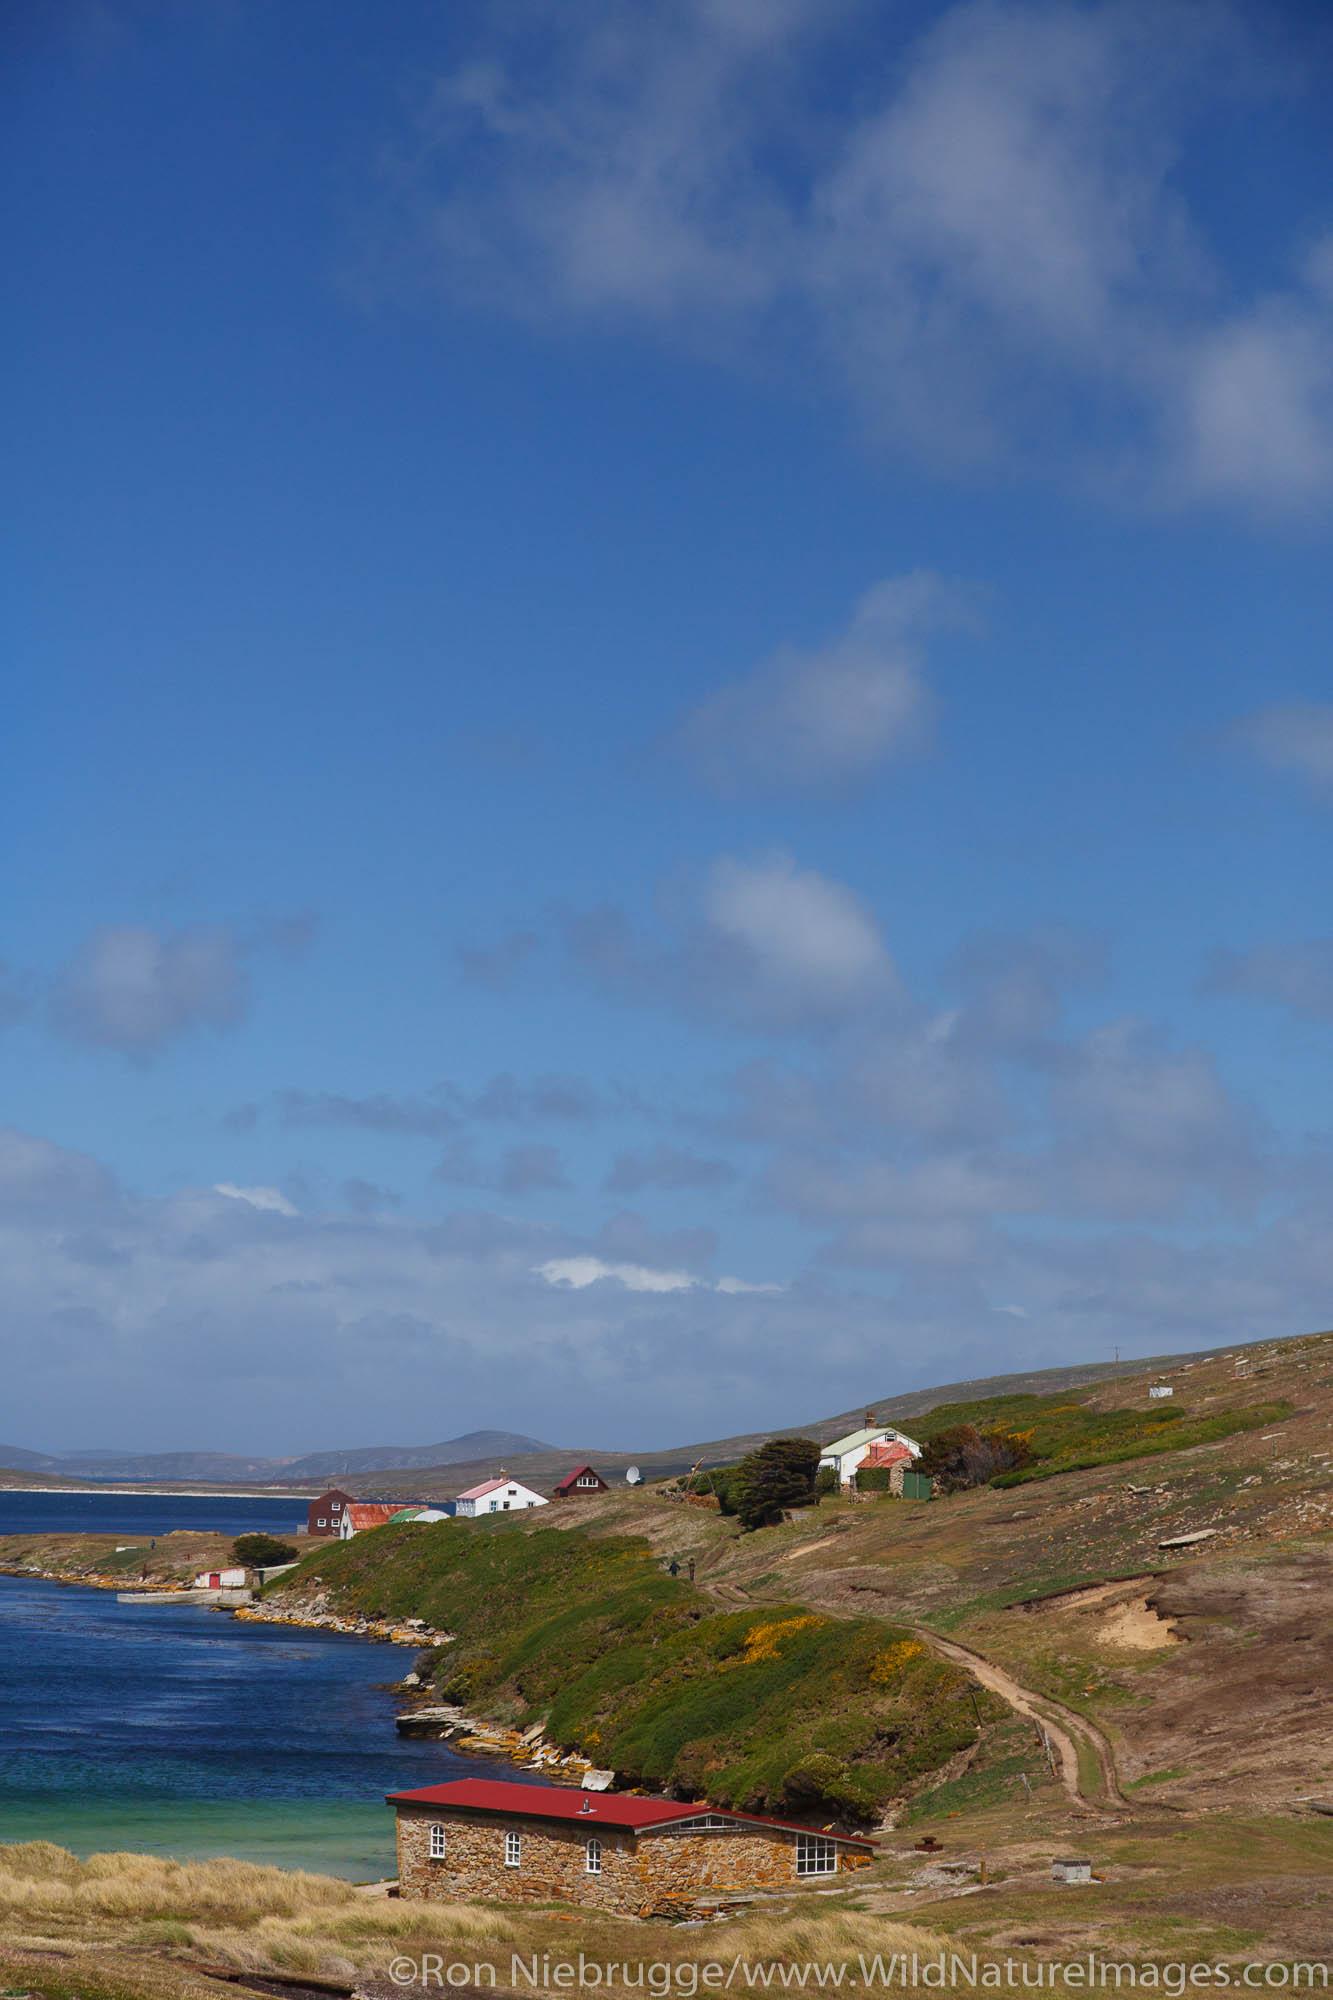 New Island Conservation Trust, New Island, Falkland Islands.